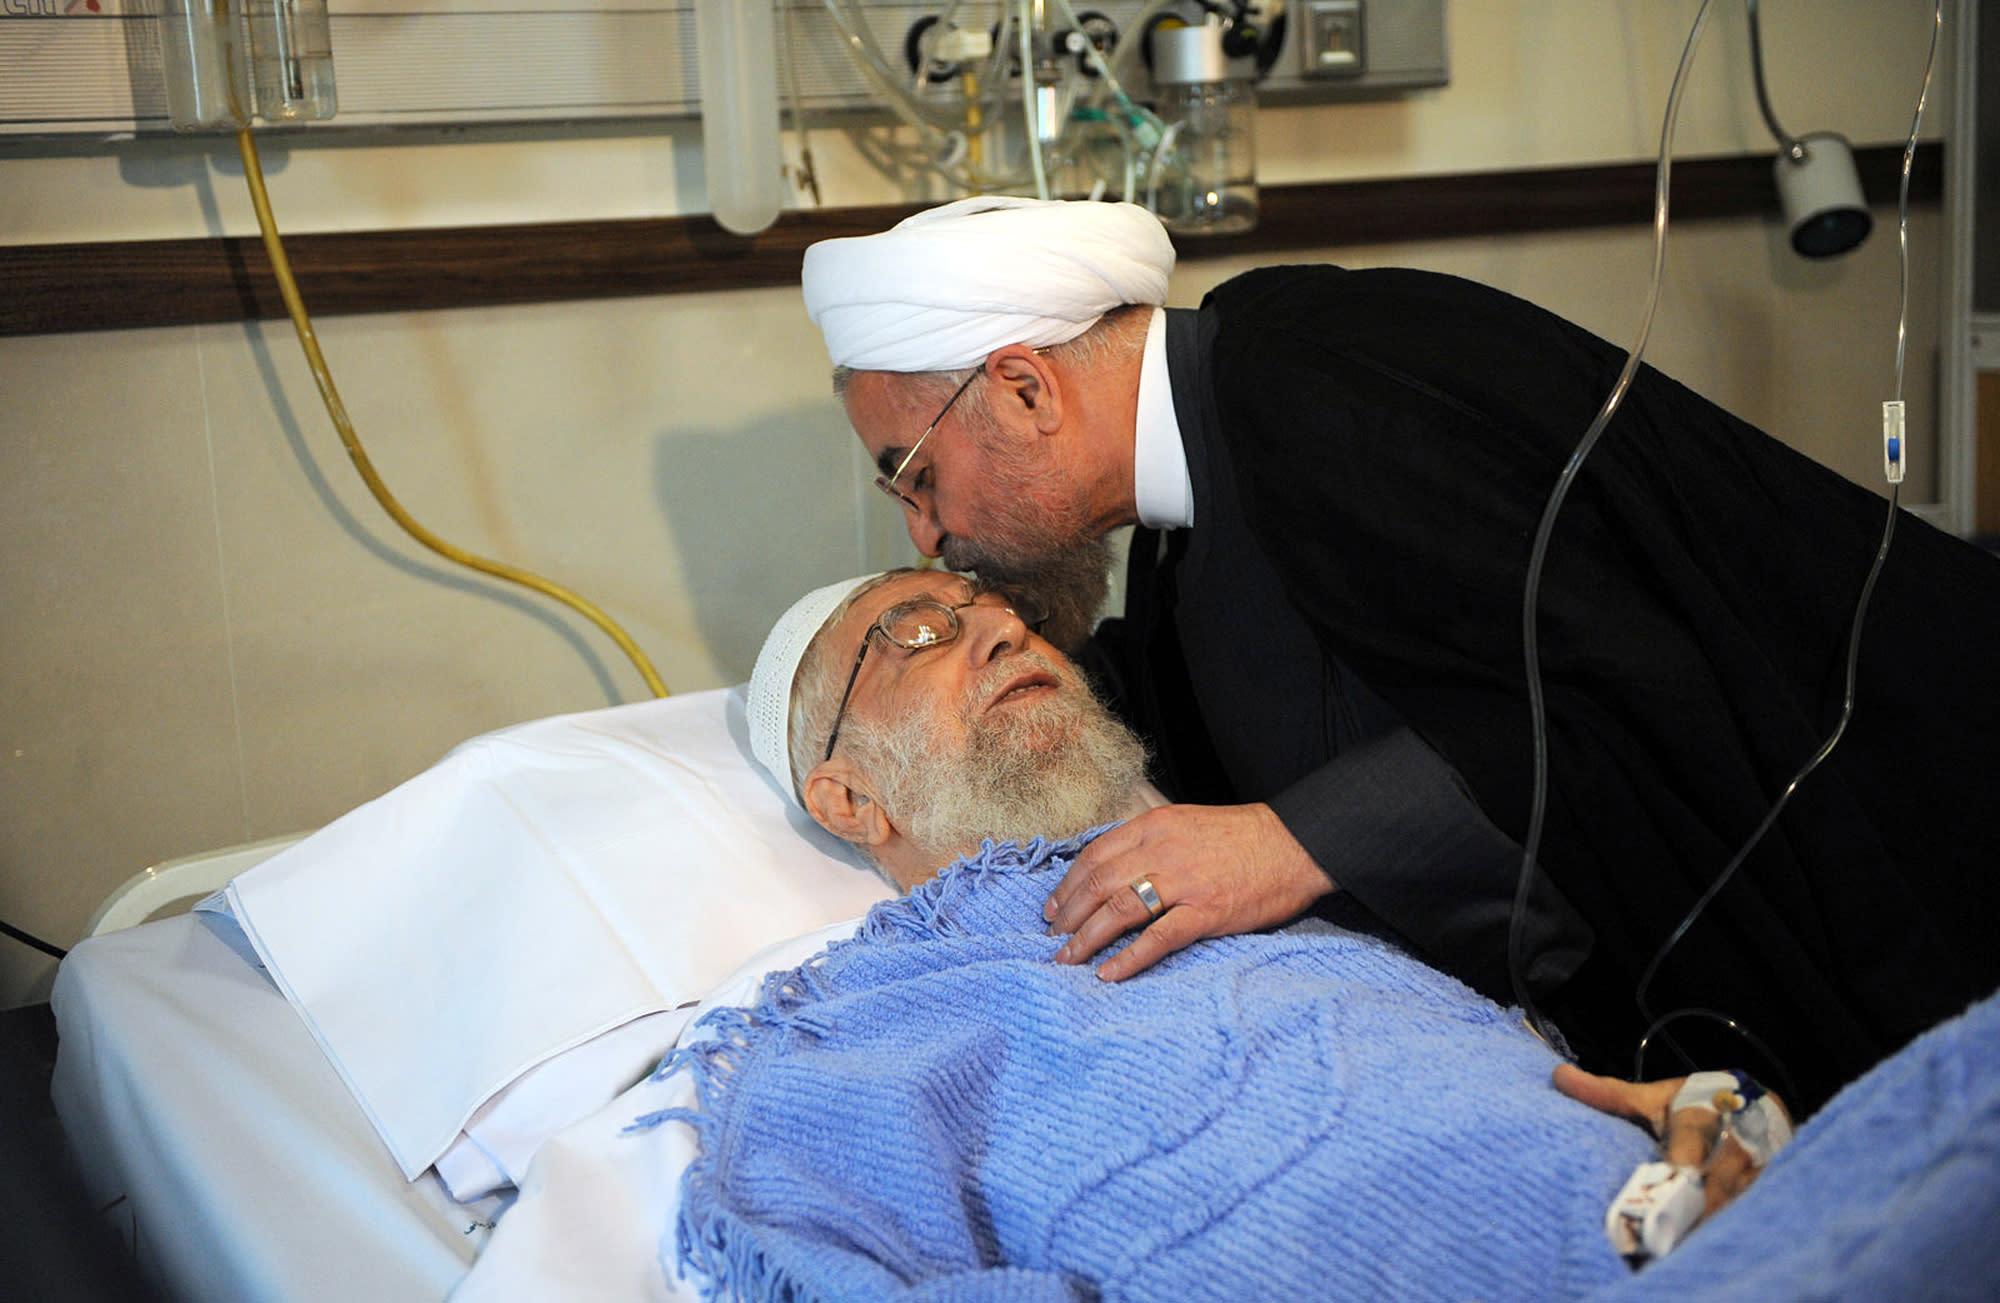 Iranian President Hassan Rouhani visits Iran's supreme leader Ayatollah Ali Khamenei at a hospital in Tehran on September 8, 2014 after Khamenei's prostate operation (AFP Photo/)